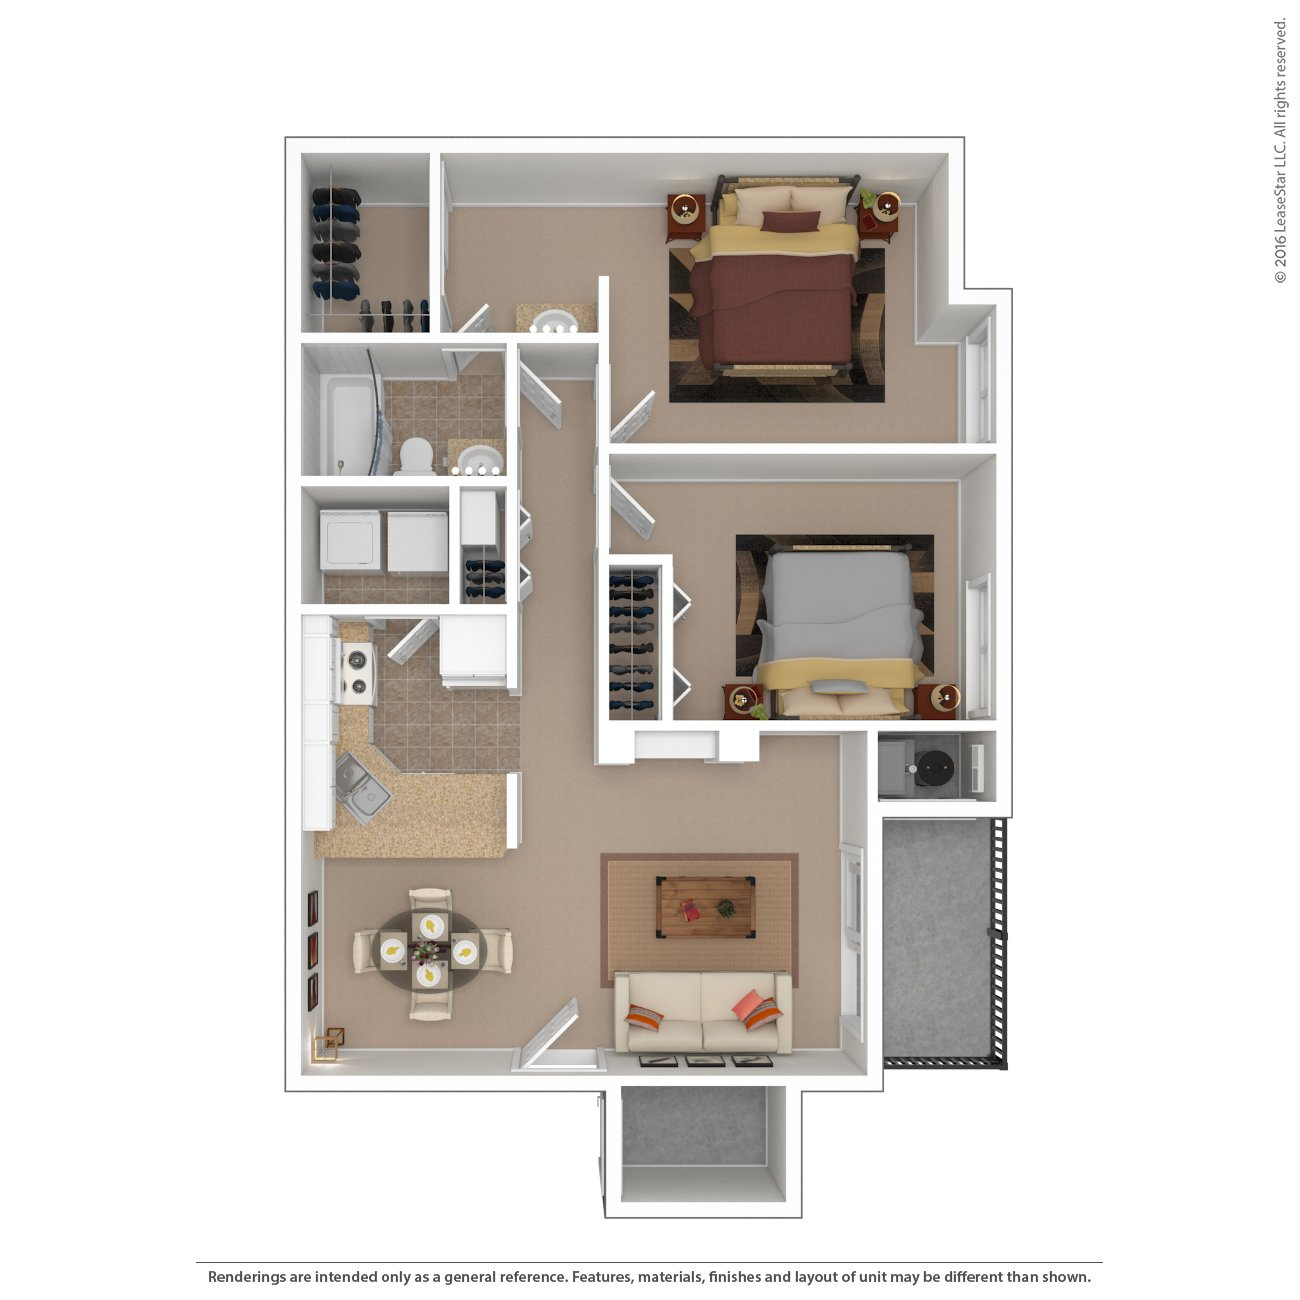 Floor Plans at Santa Fe Apartments in Salt Lake City, UT